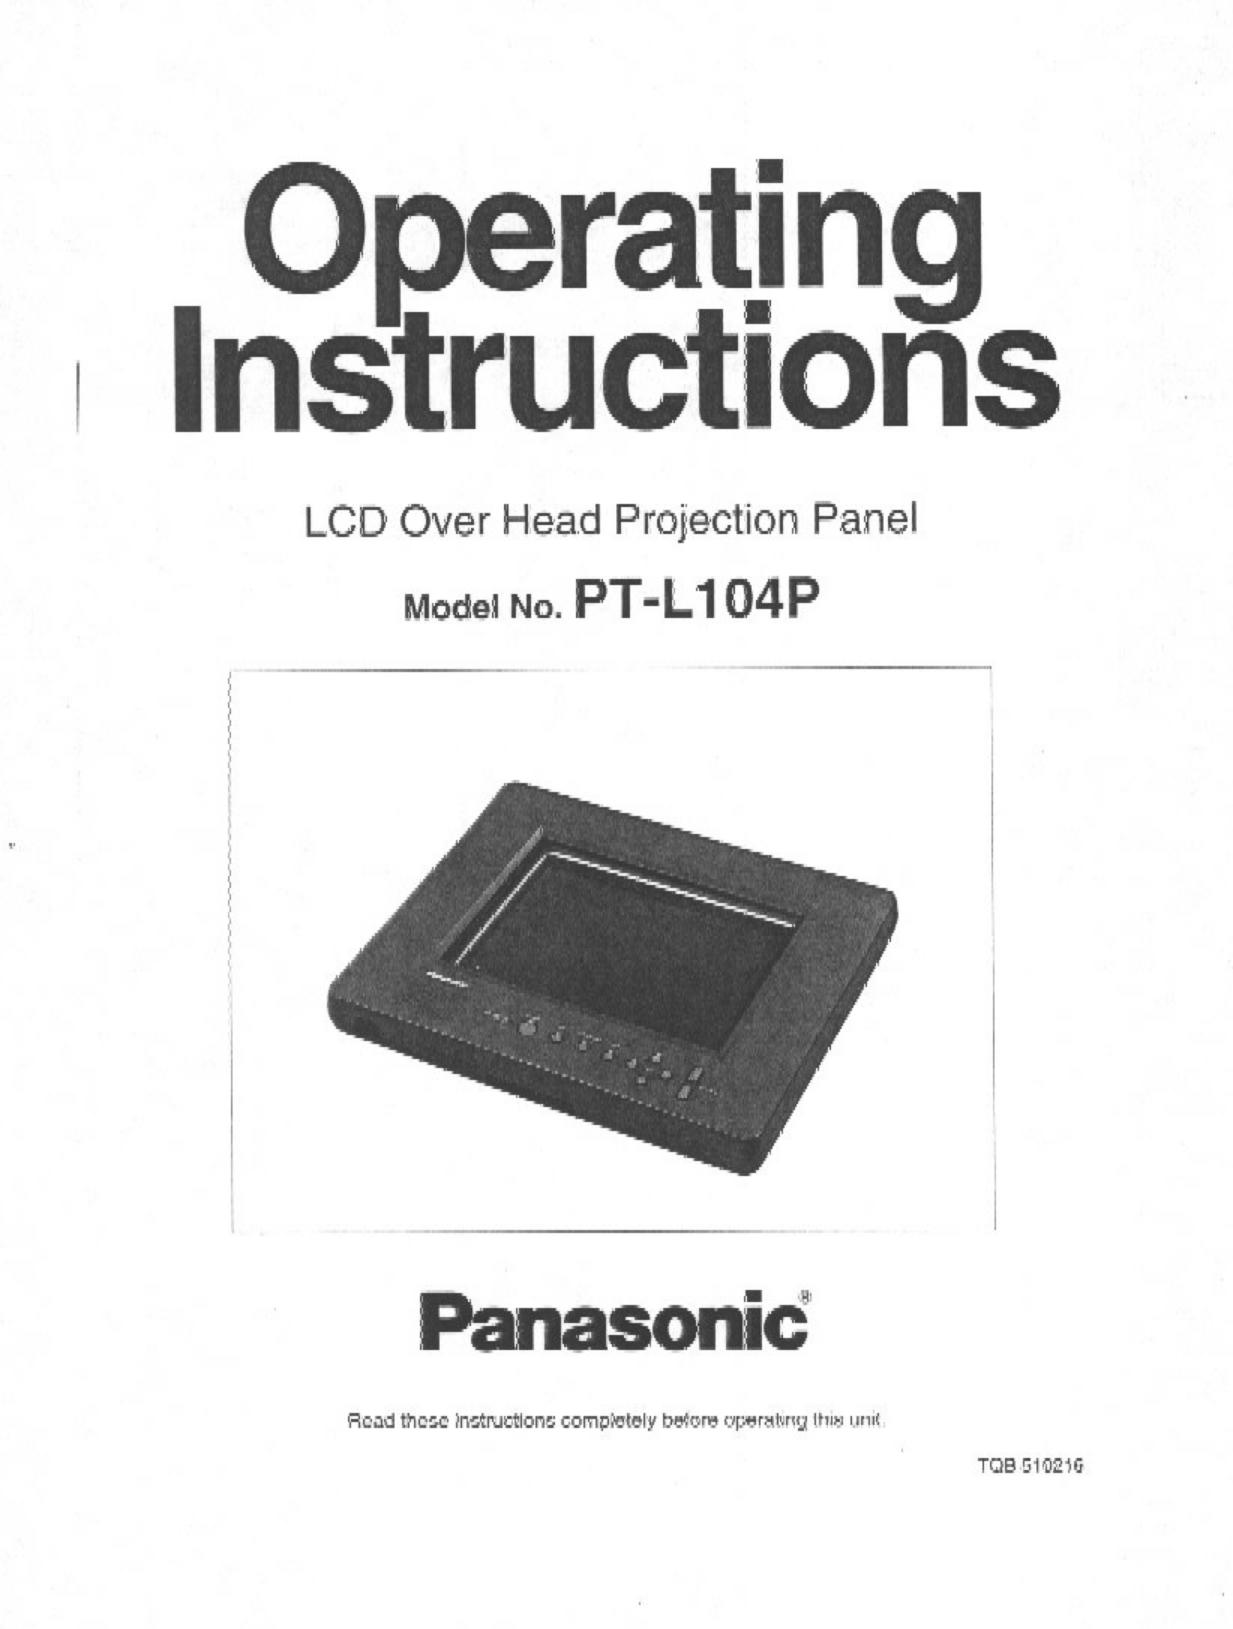 pdf for Panasonic Projector PT-L104P manual